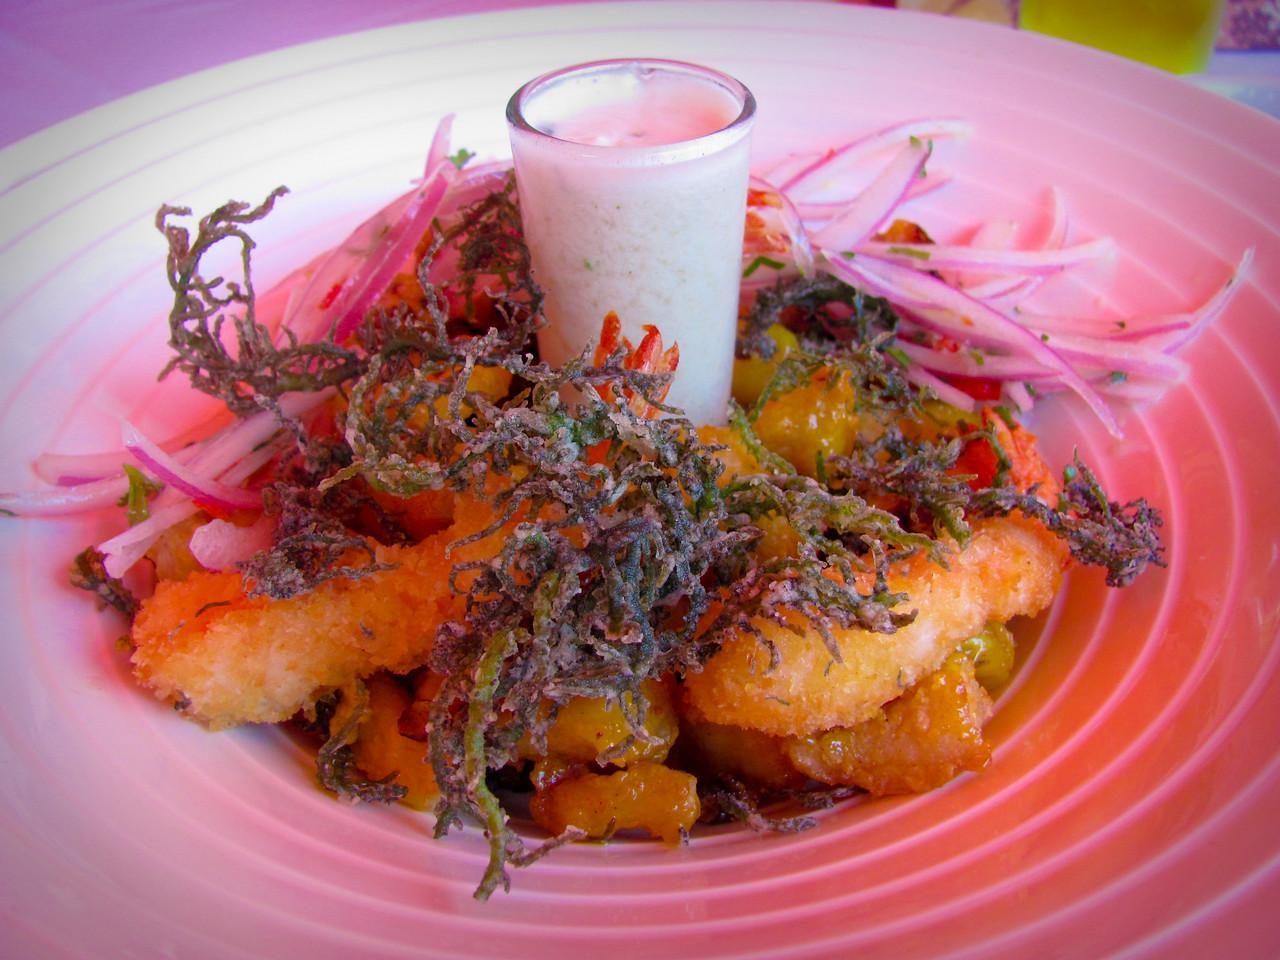 Jalea Glaseada con yuyo crocante, Alfresco, Lima